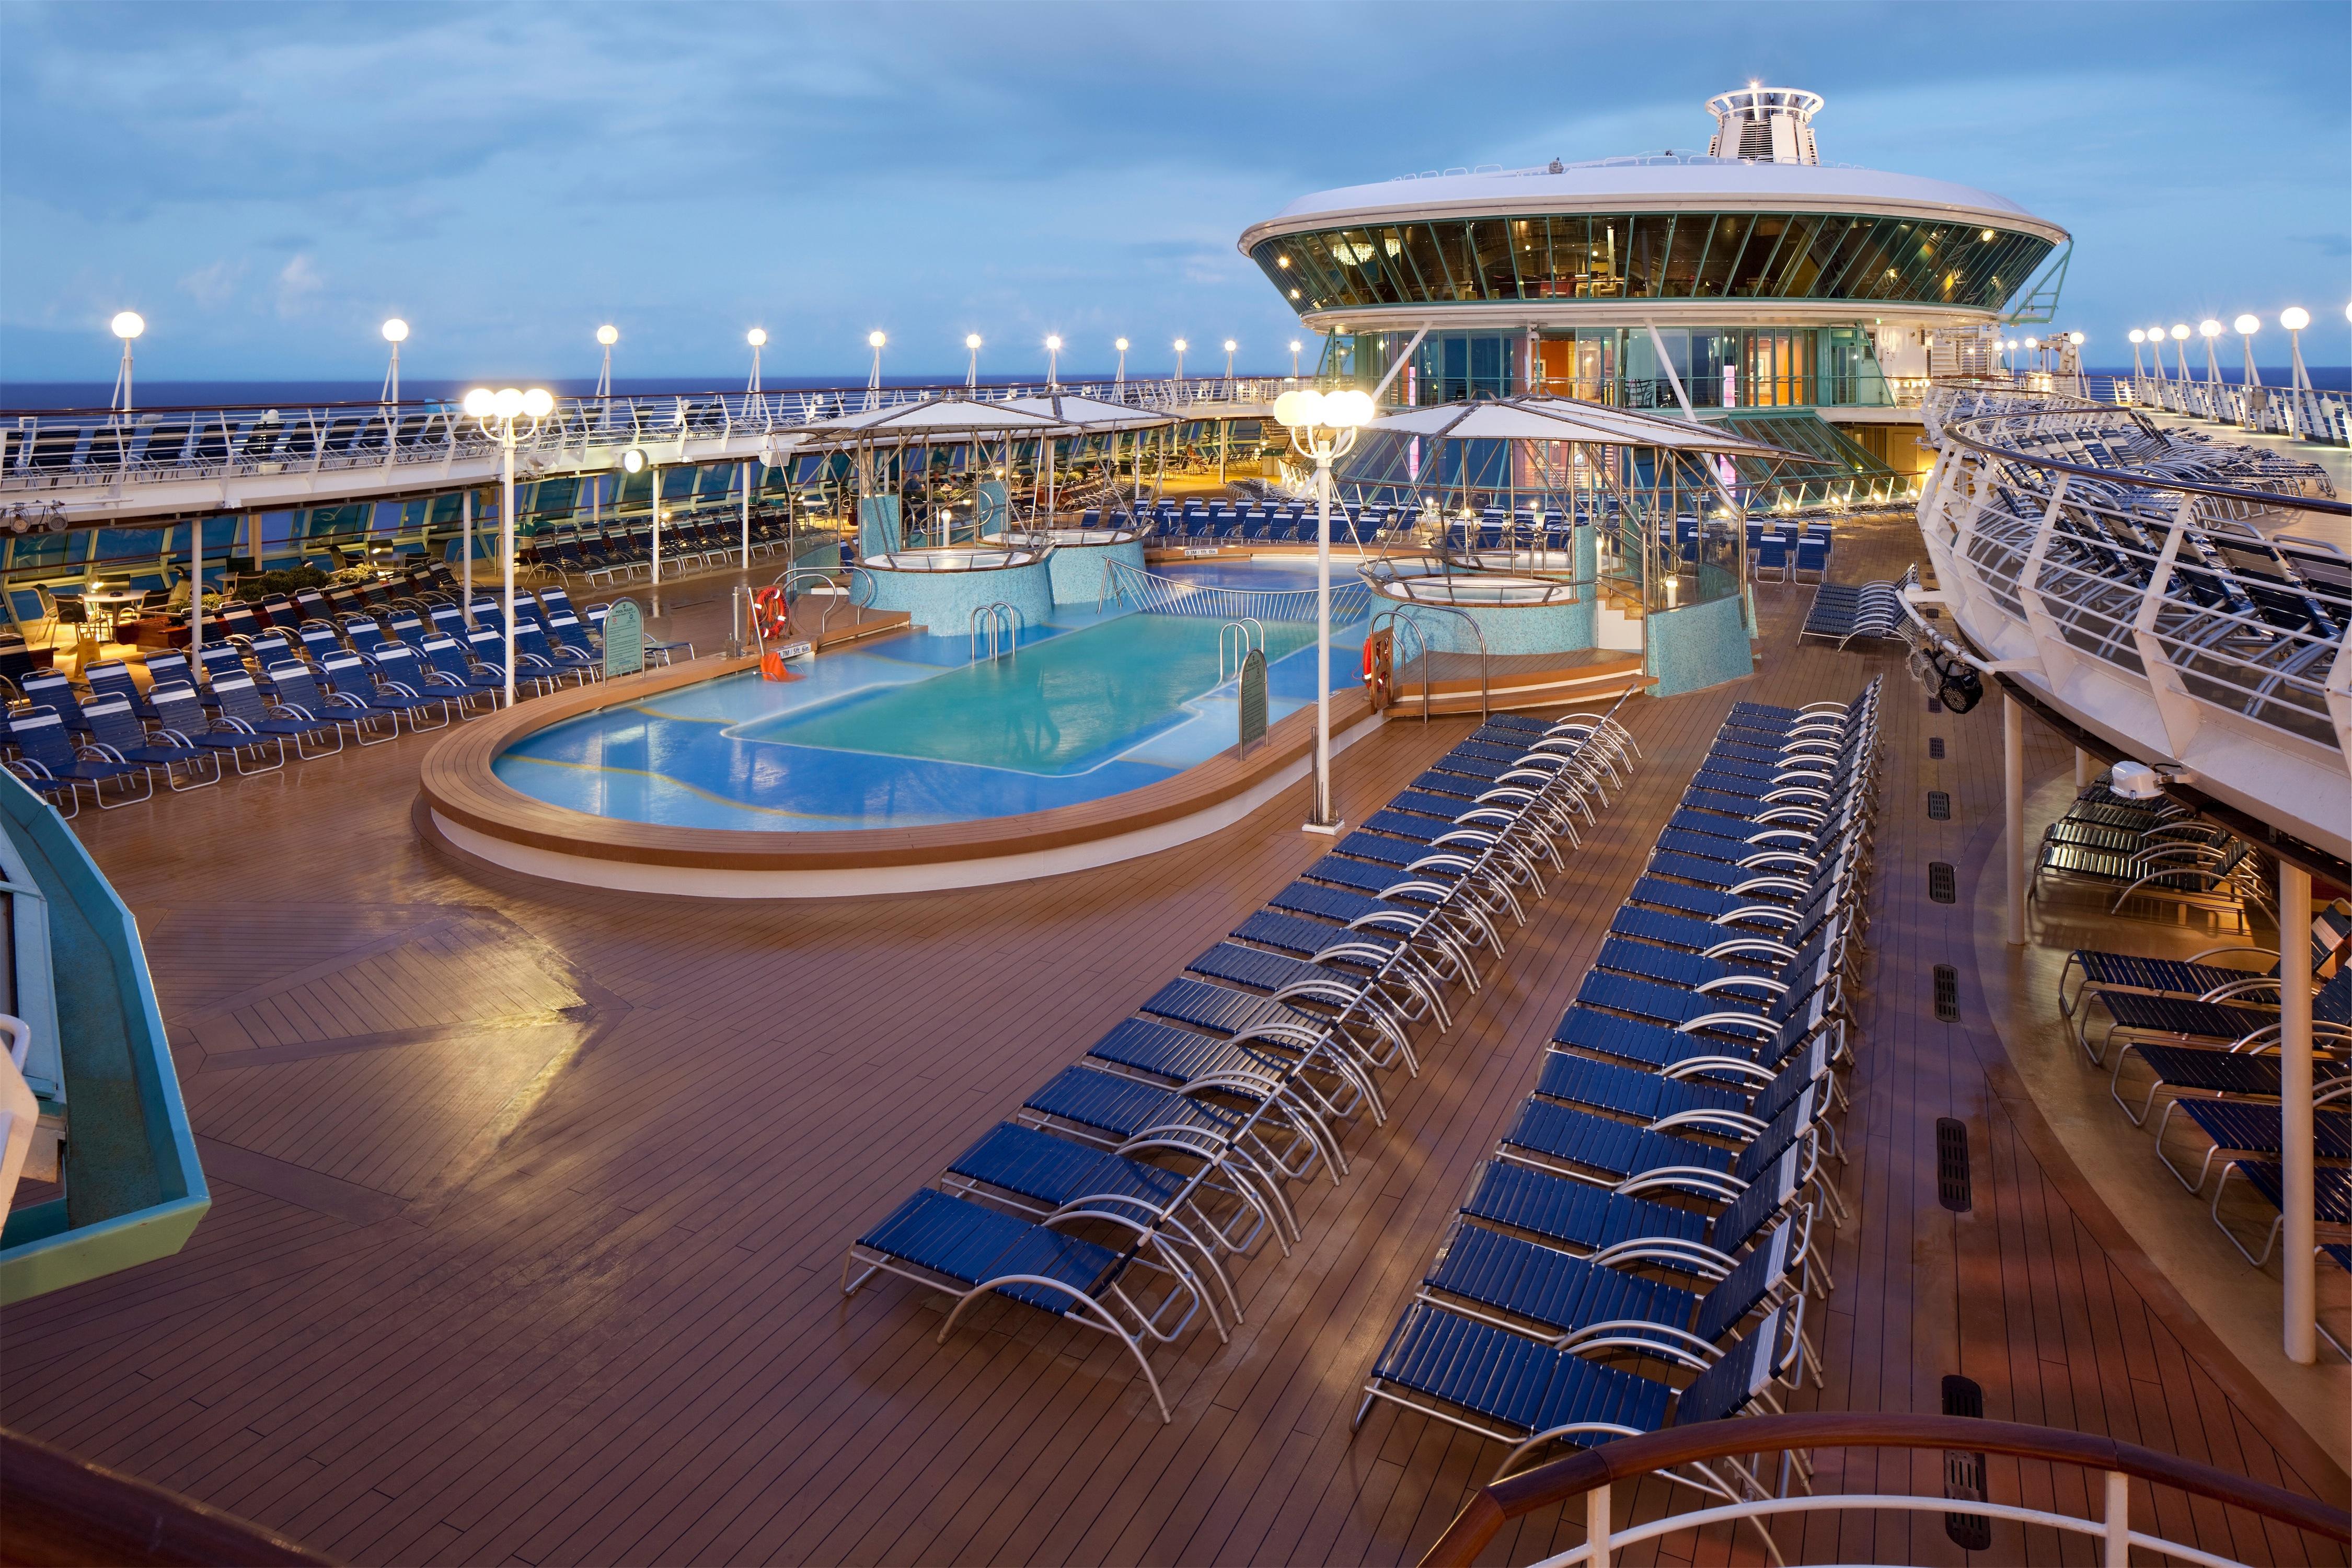 Royal Caribbean International Rhapsody of the Seas Exterior Pool Deck.jpg